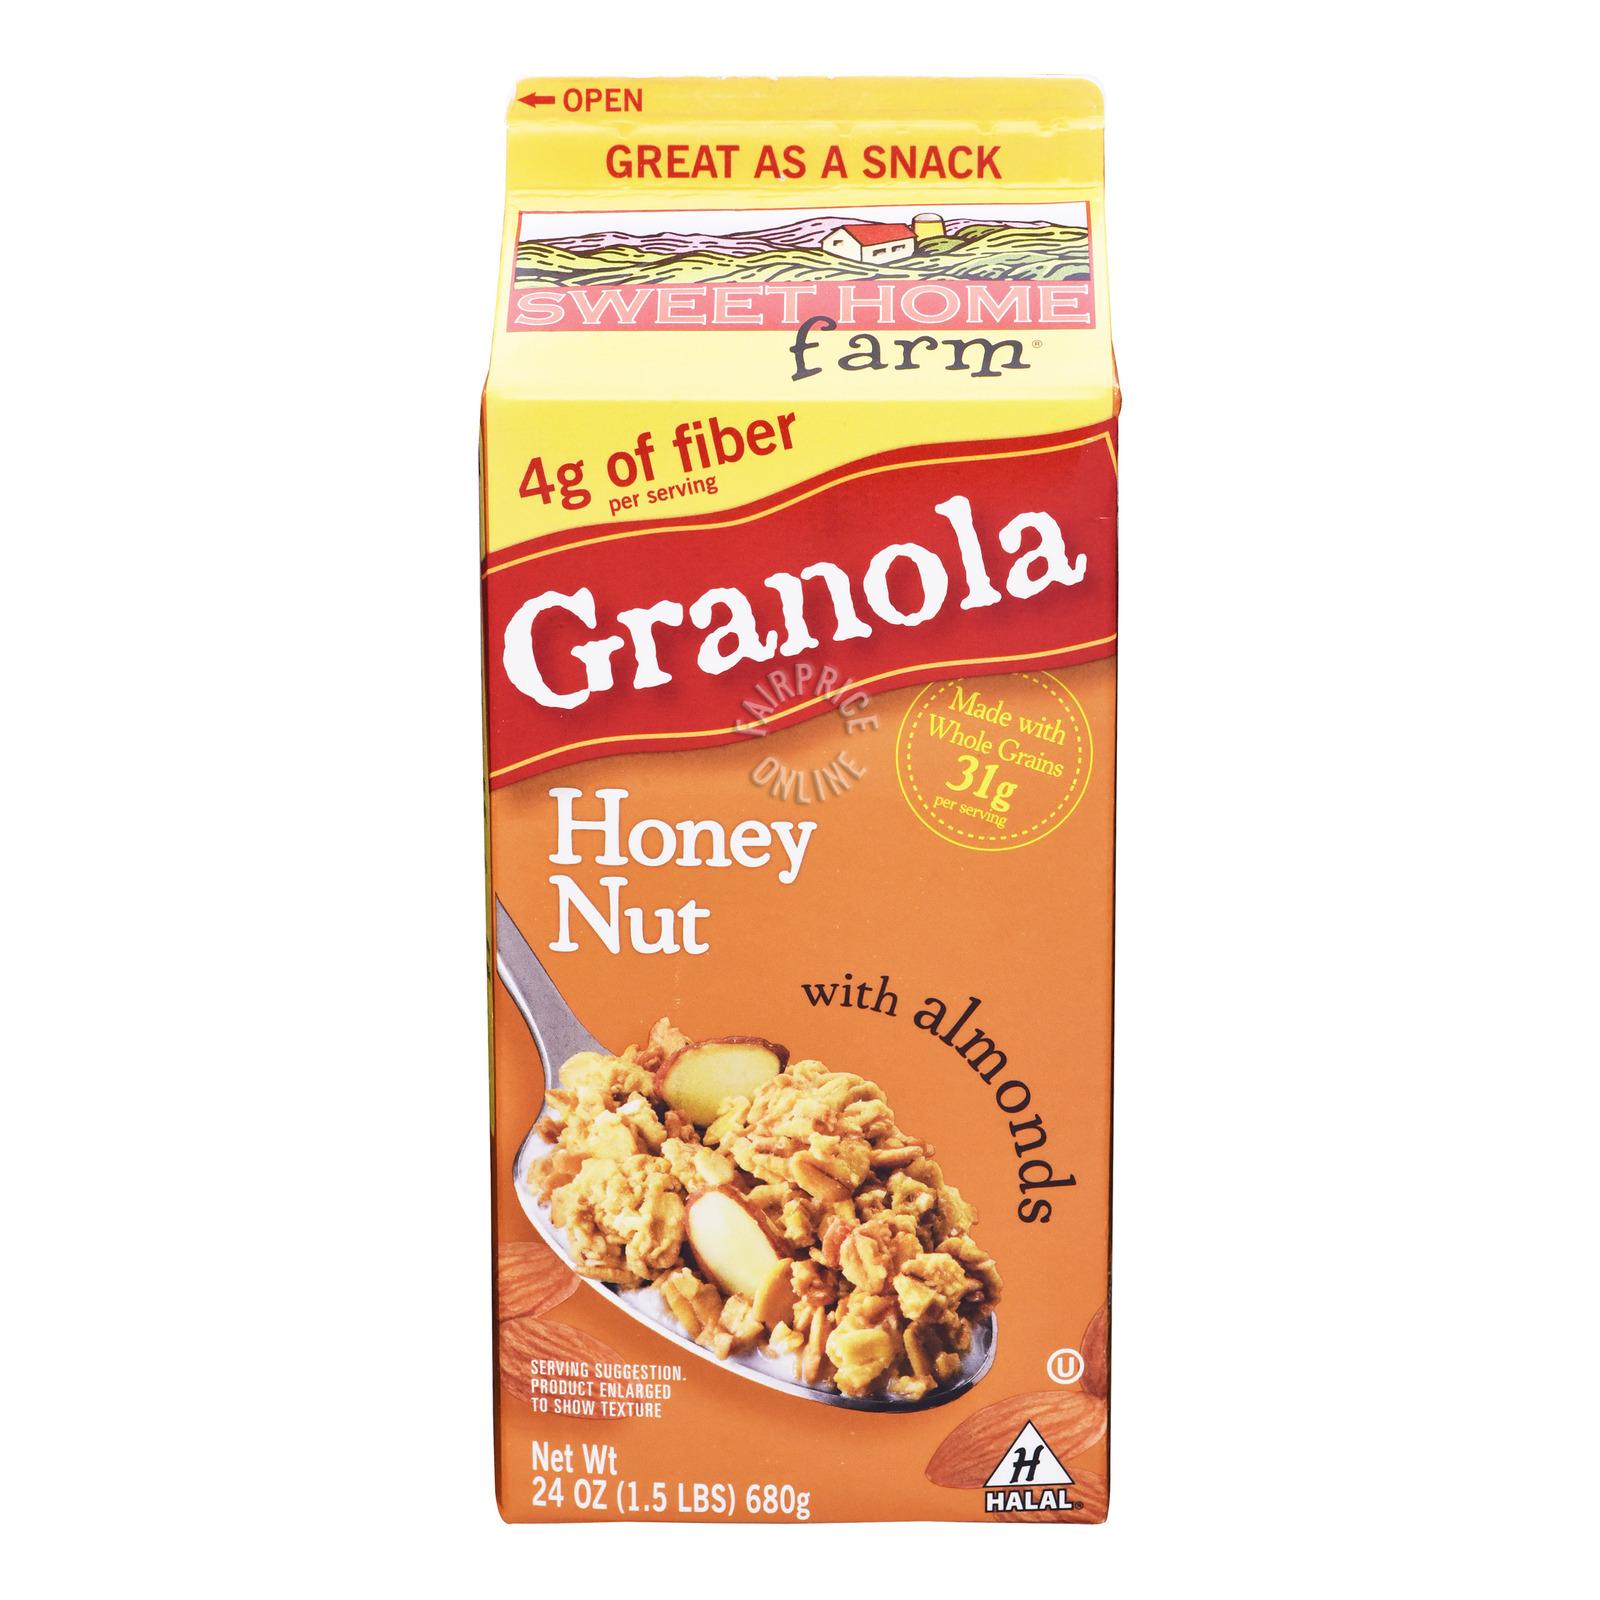 Sweet Home Farm Granola - Honey Nut with Almonds